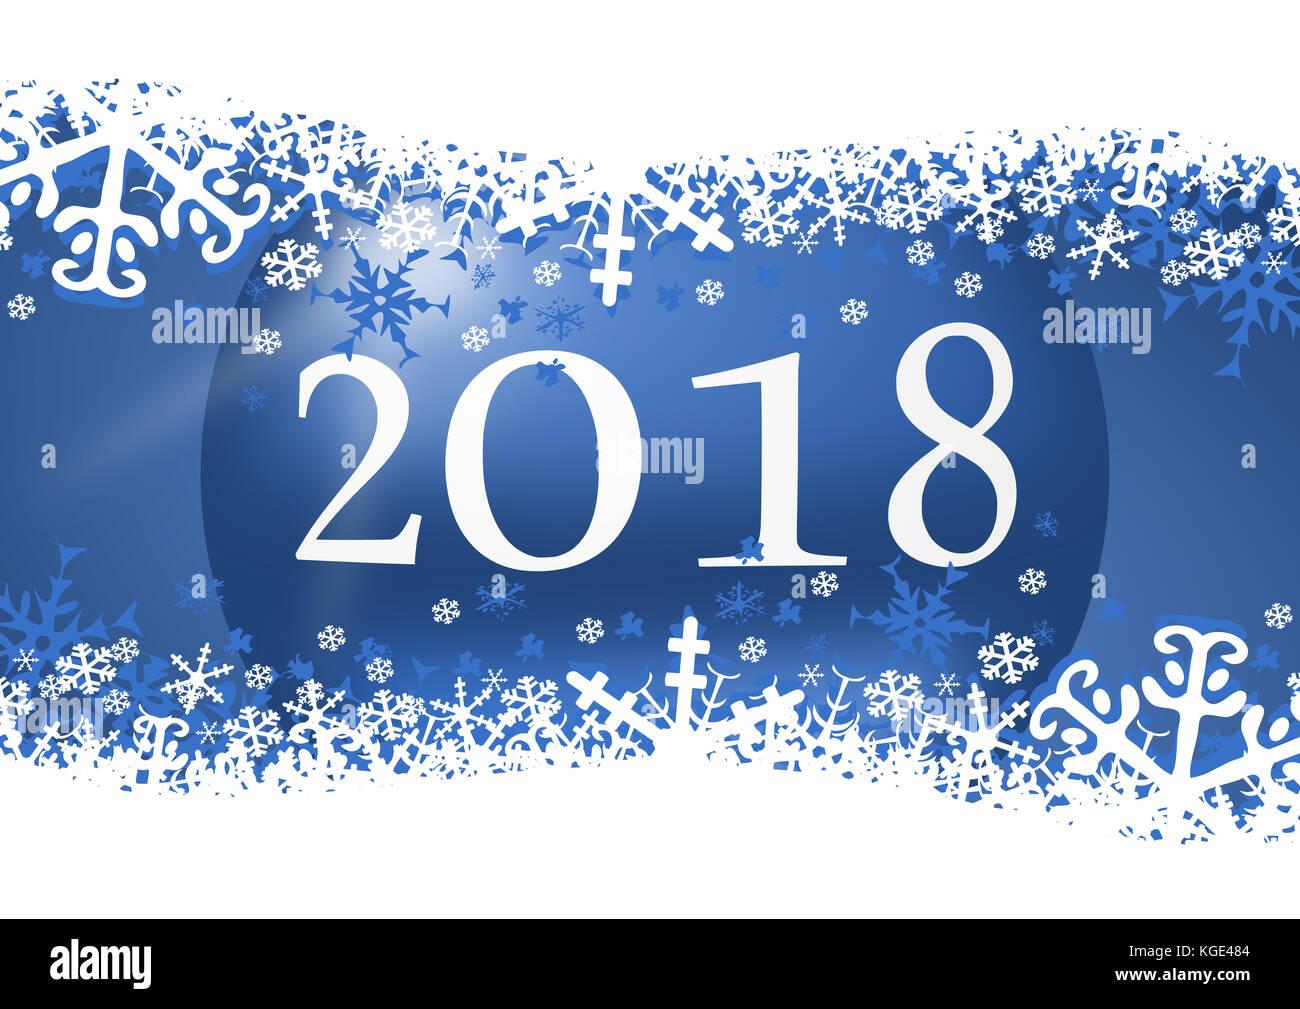 Happy New Year 2018 Greeting Stock Photos & Happy New Year